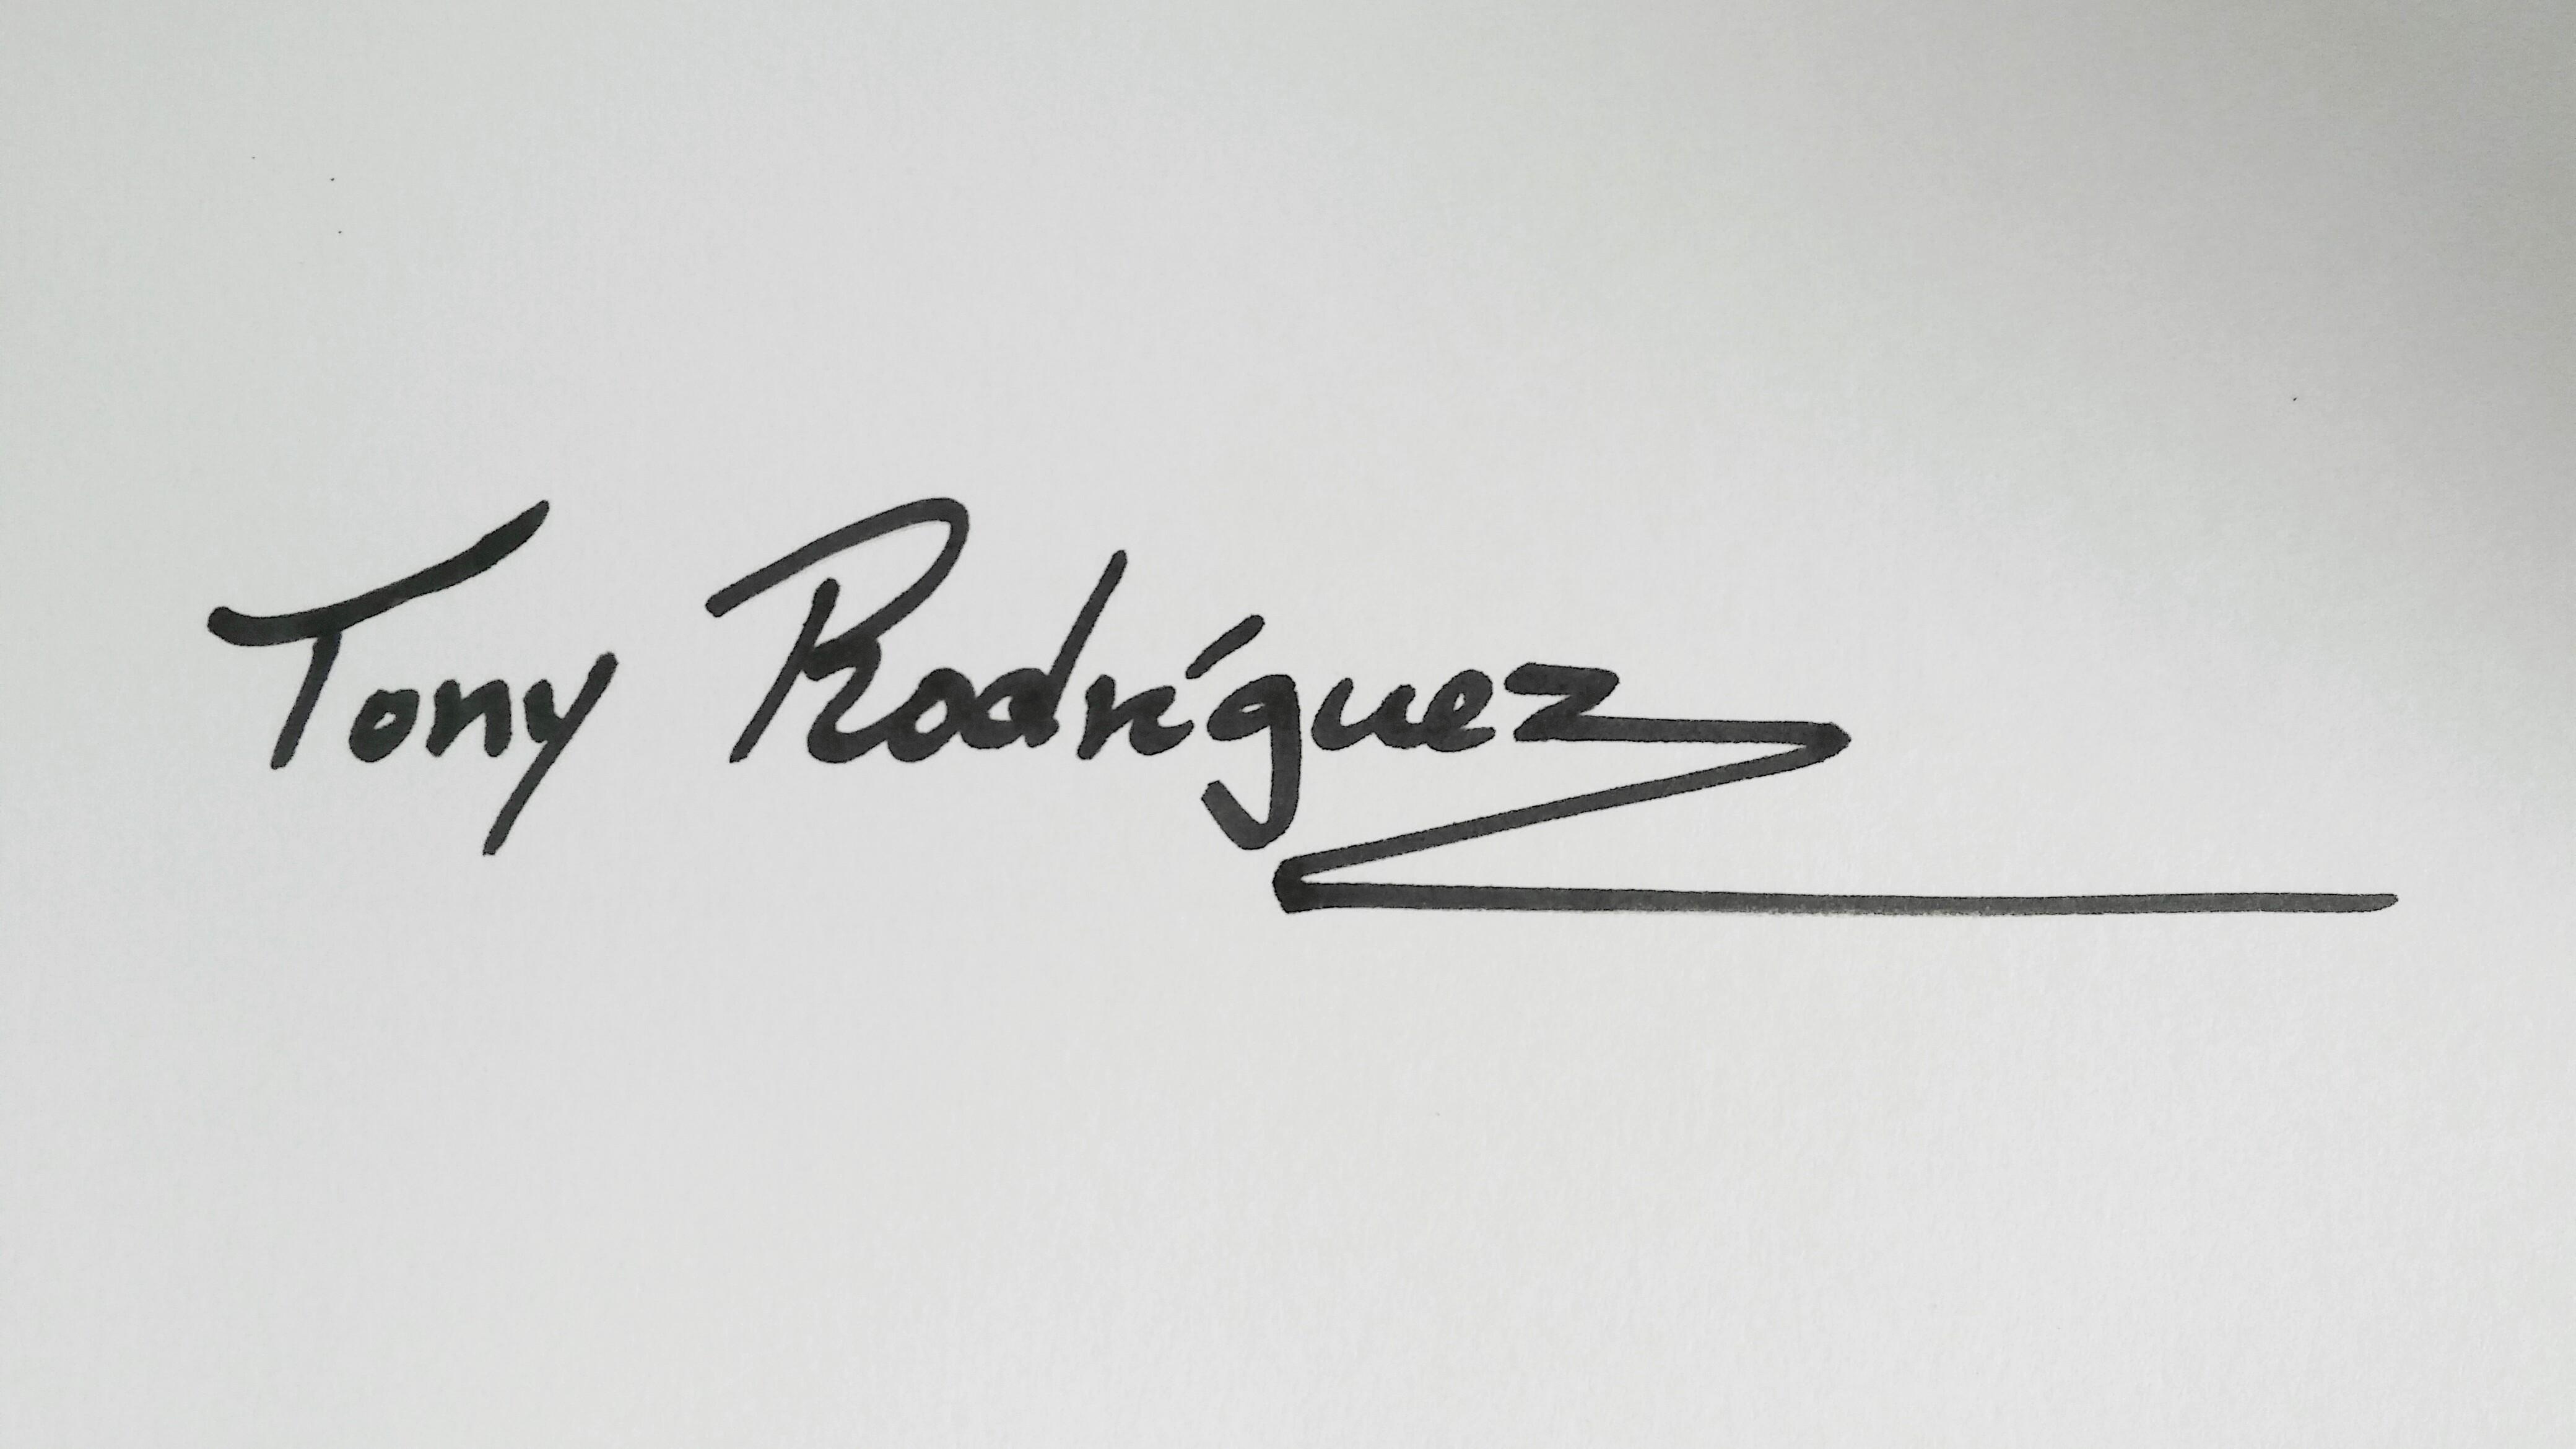 Tony Rodriguez Signature